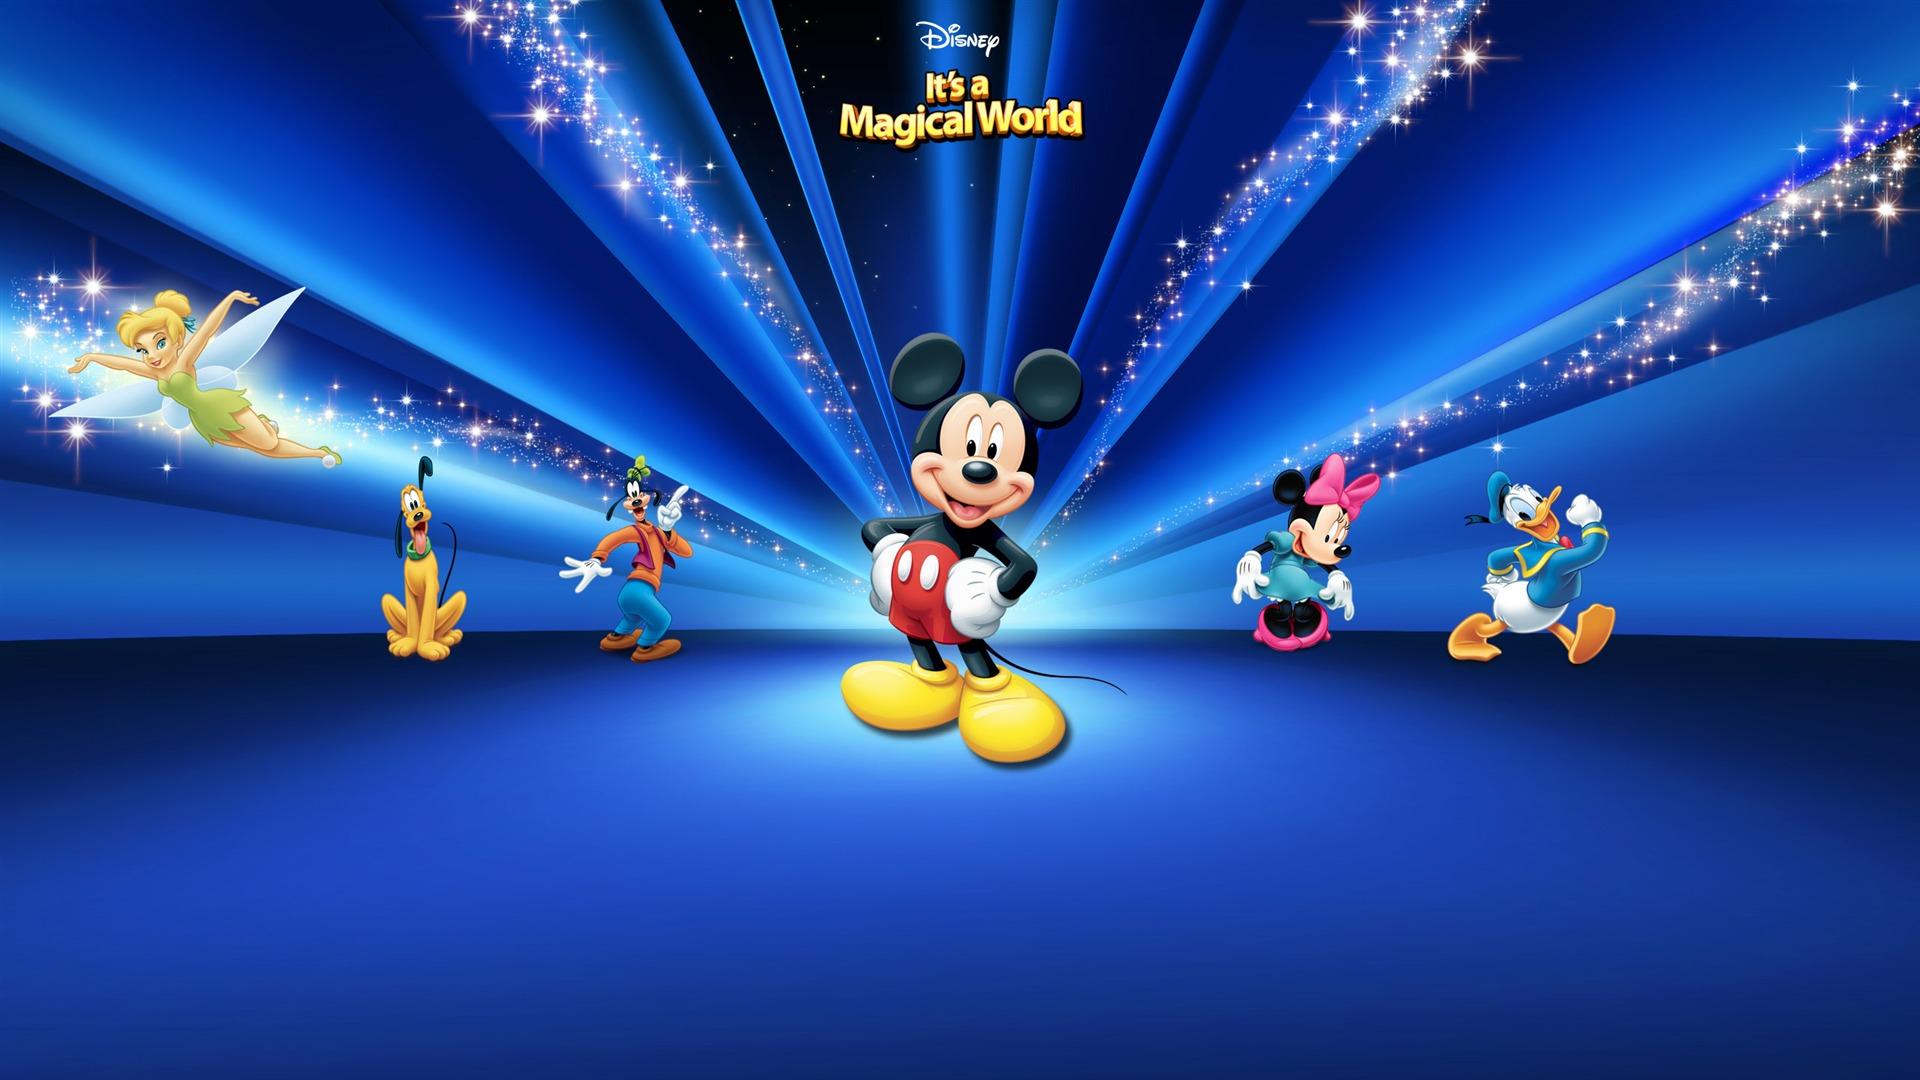 Disney Desktop Wallpaper Hd: HD Desktop Wallpaper-1920x1080